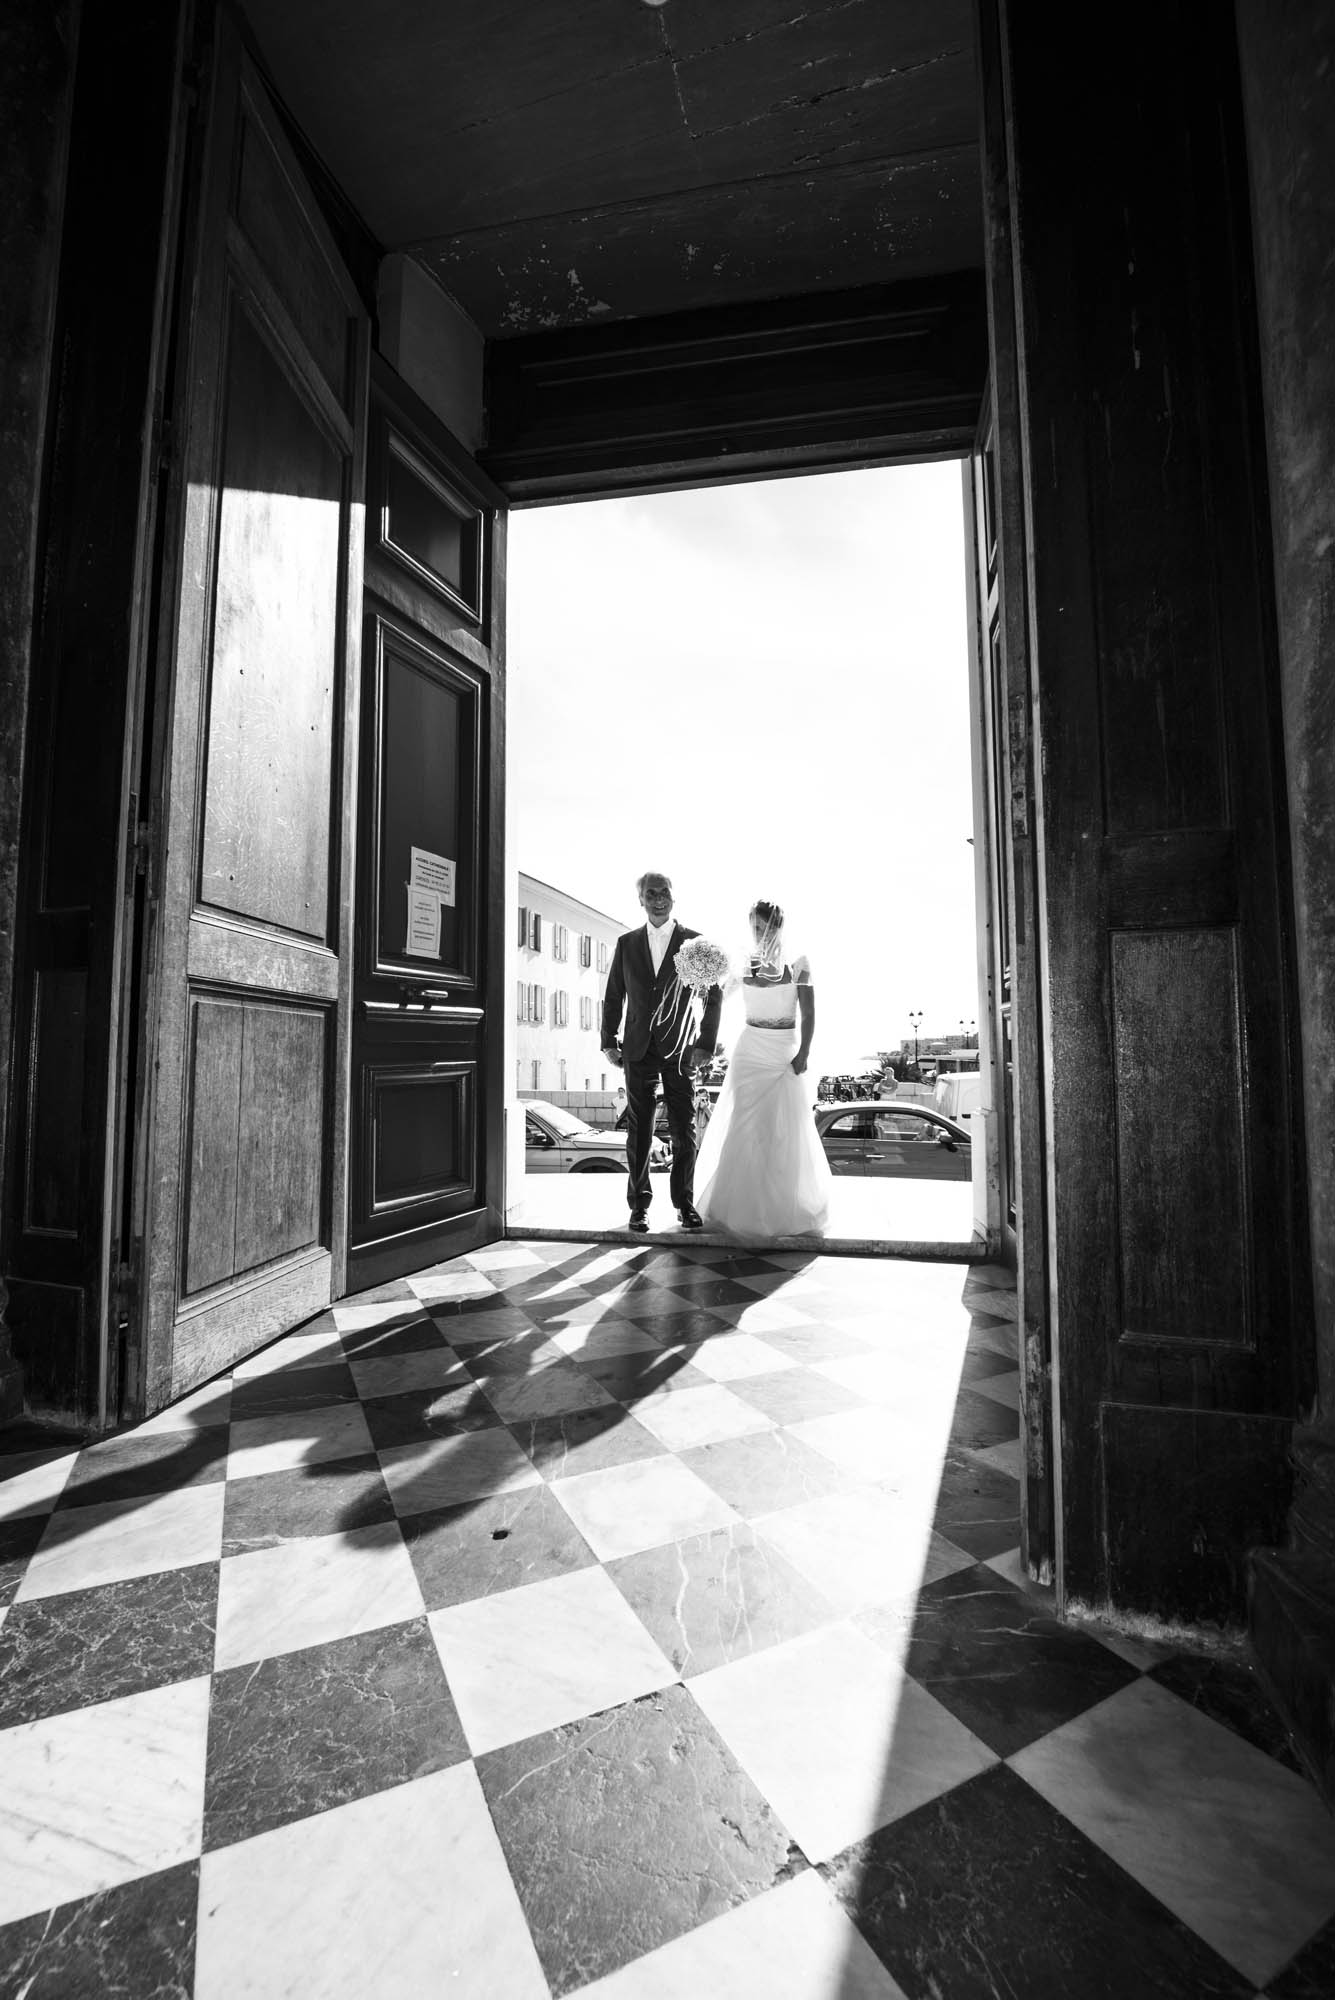 WEDDING-PHOTOGRAPHY-IN-CORSICA_001.jpg